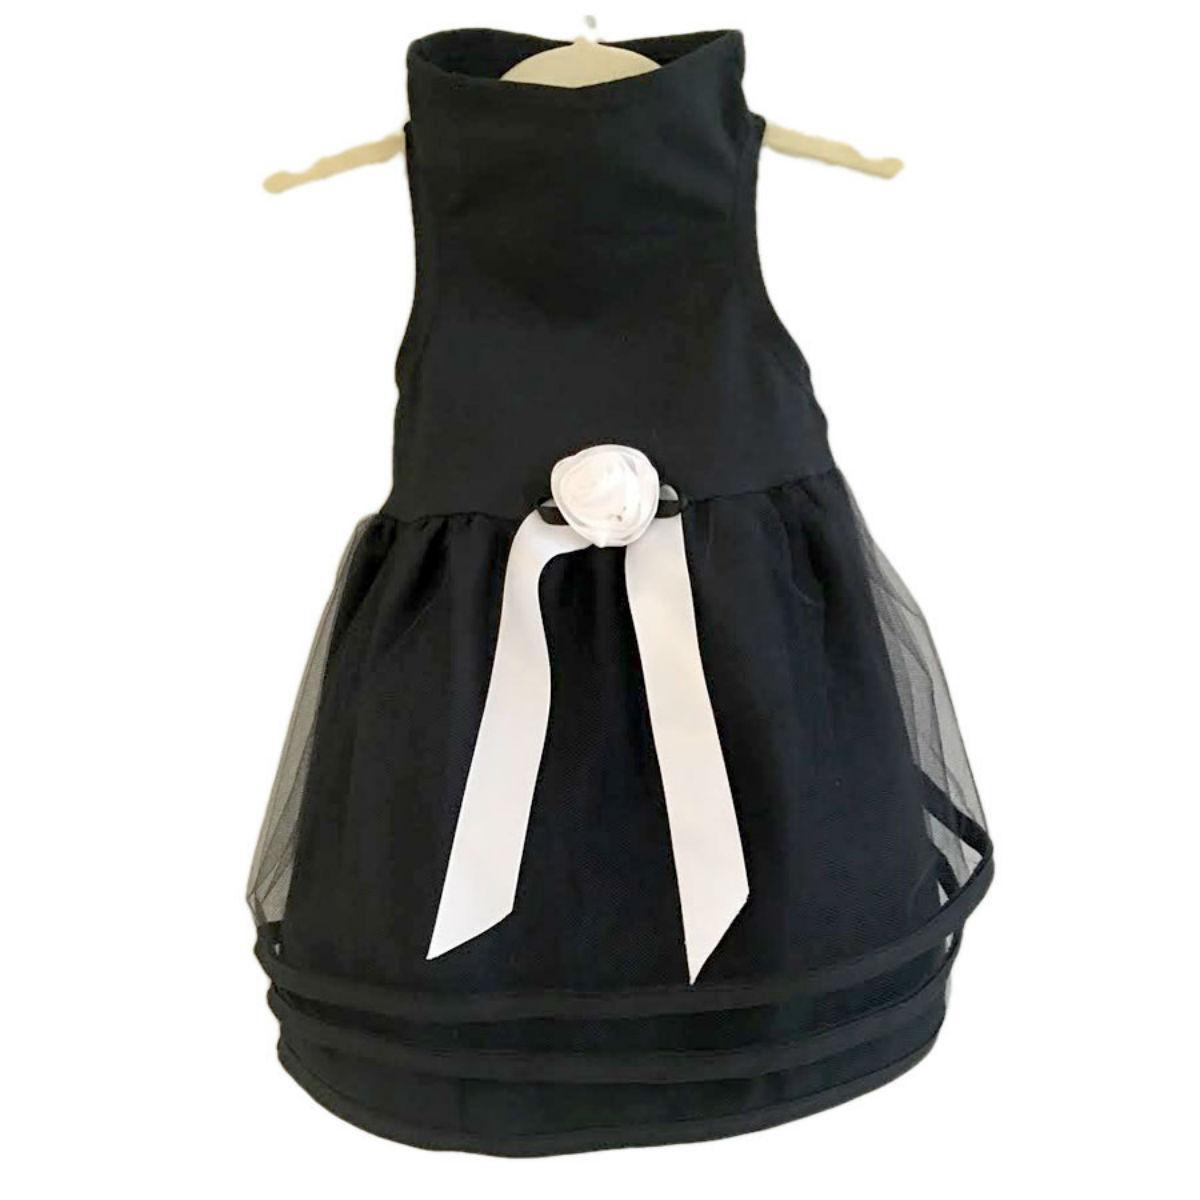 Daisy & Lucy Black Tulle Dog Dress